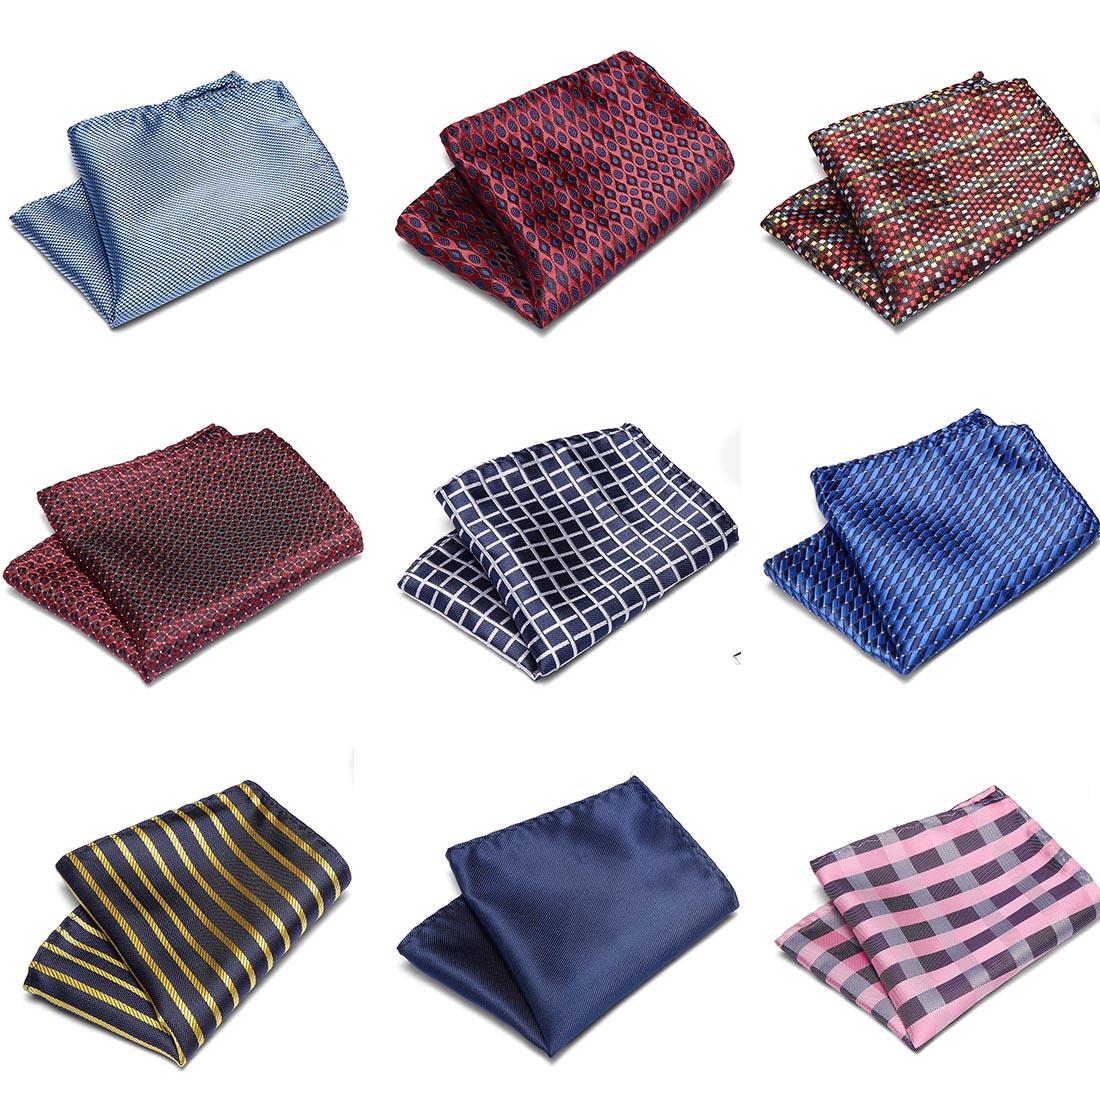 Men Wedding Pocket Square 100%Silk Match For Suit Tie Men's Handkerchief Accessories Jacquard Solid Dots Stripes Pattern 22*22cm